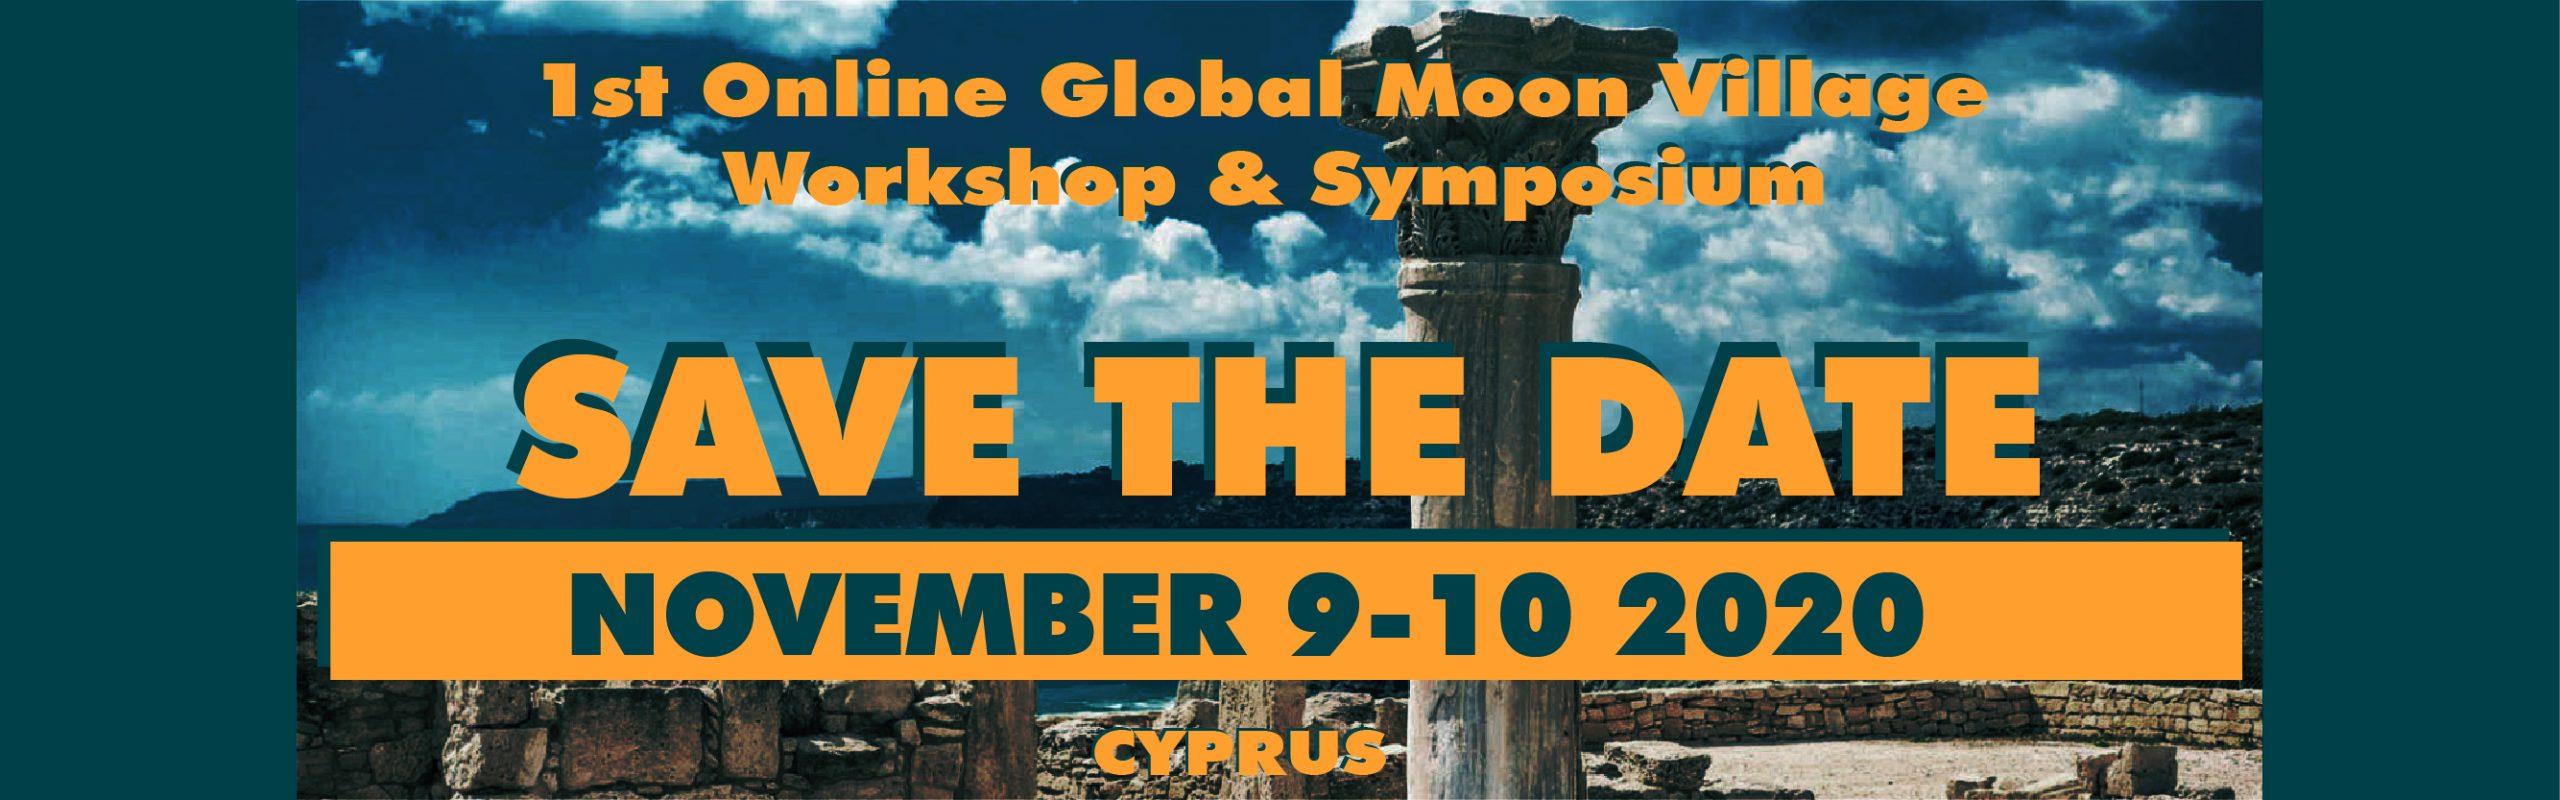 Save the date – 1st Online Global Moon Village Workshop & Symposium